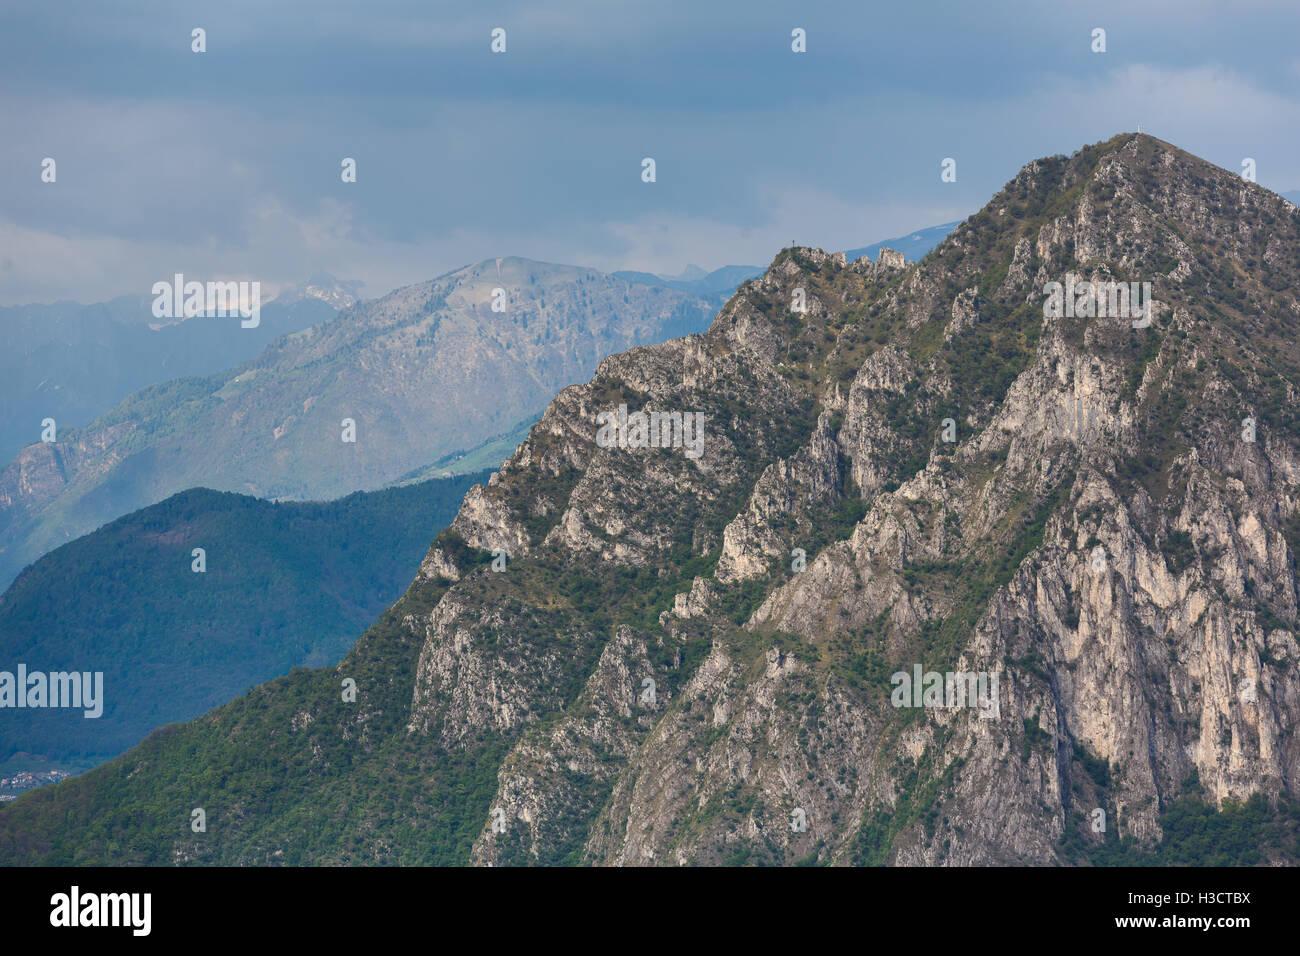 The Dolomite mountains at Lake Iseo, Italy - Stock Image